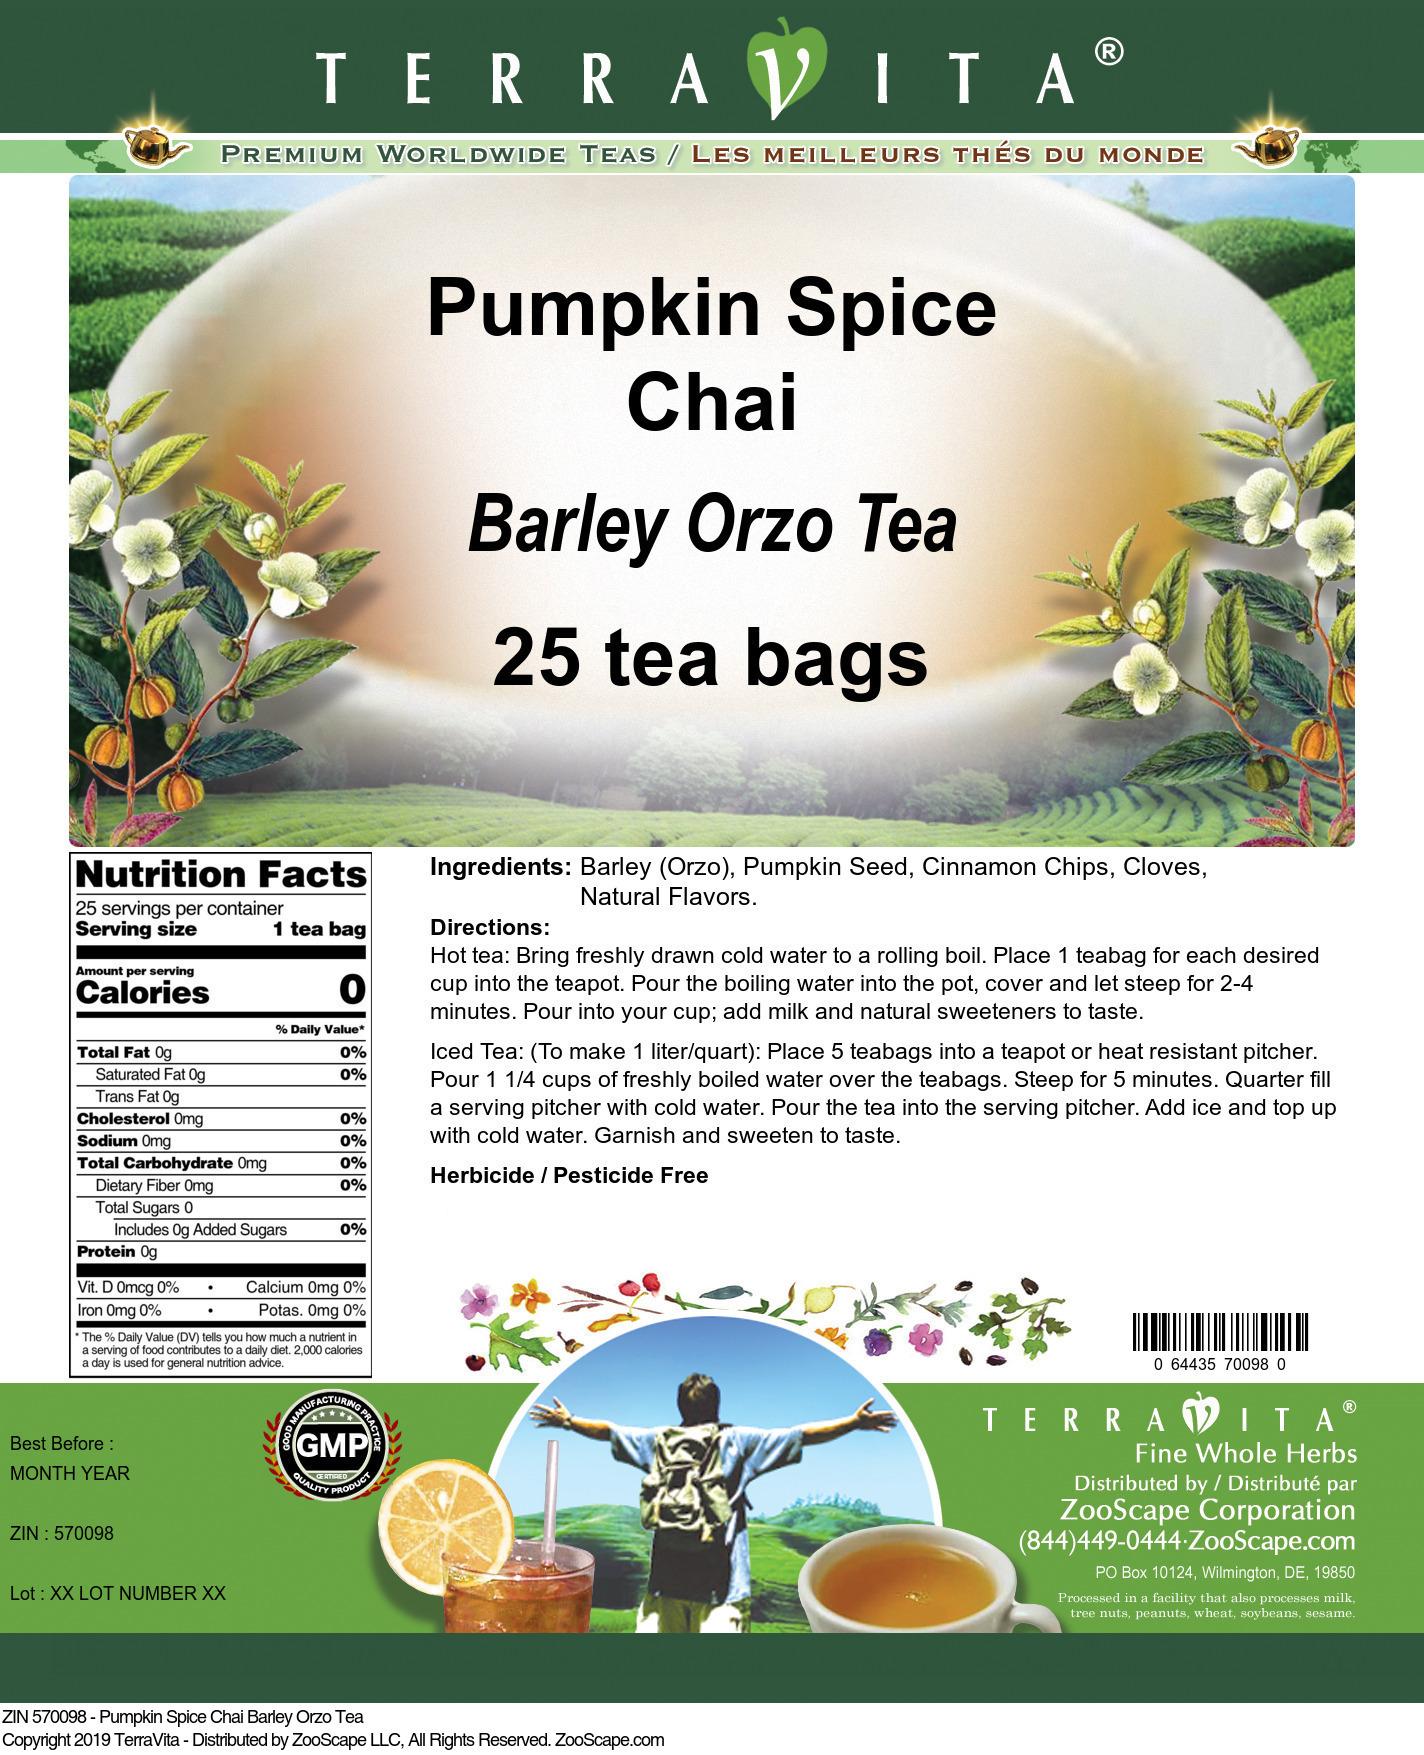 Pumpkin Spice Chai Barley Orzo Tea